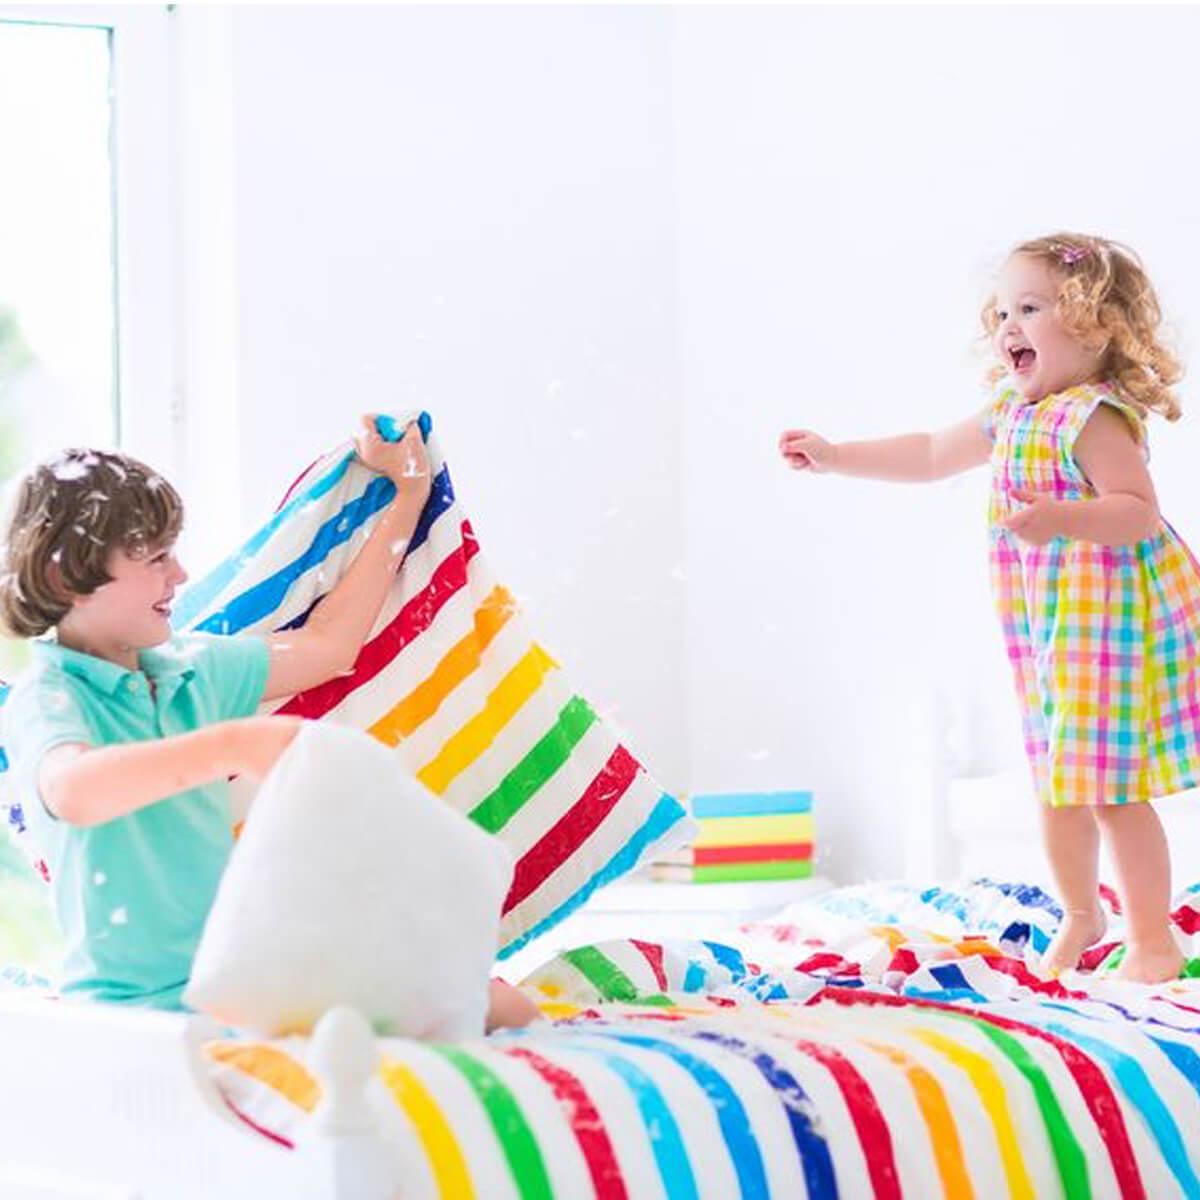 بیش فعالی کودکان – ADHD